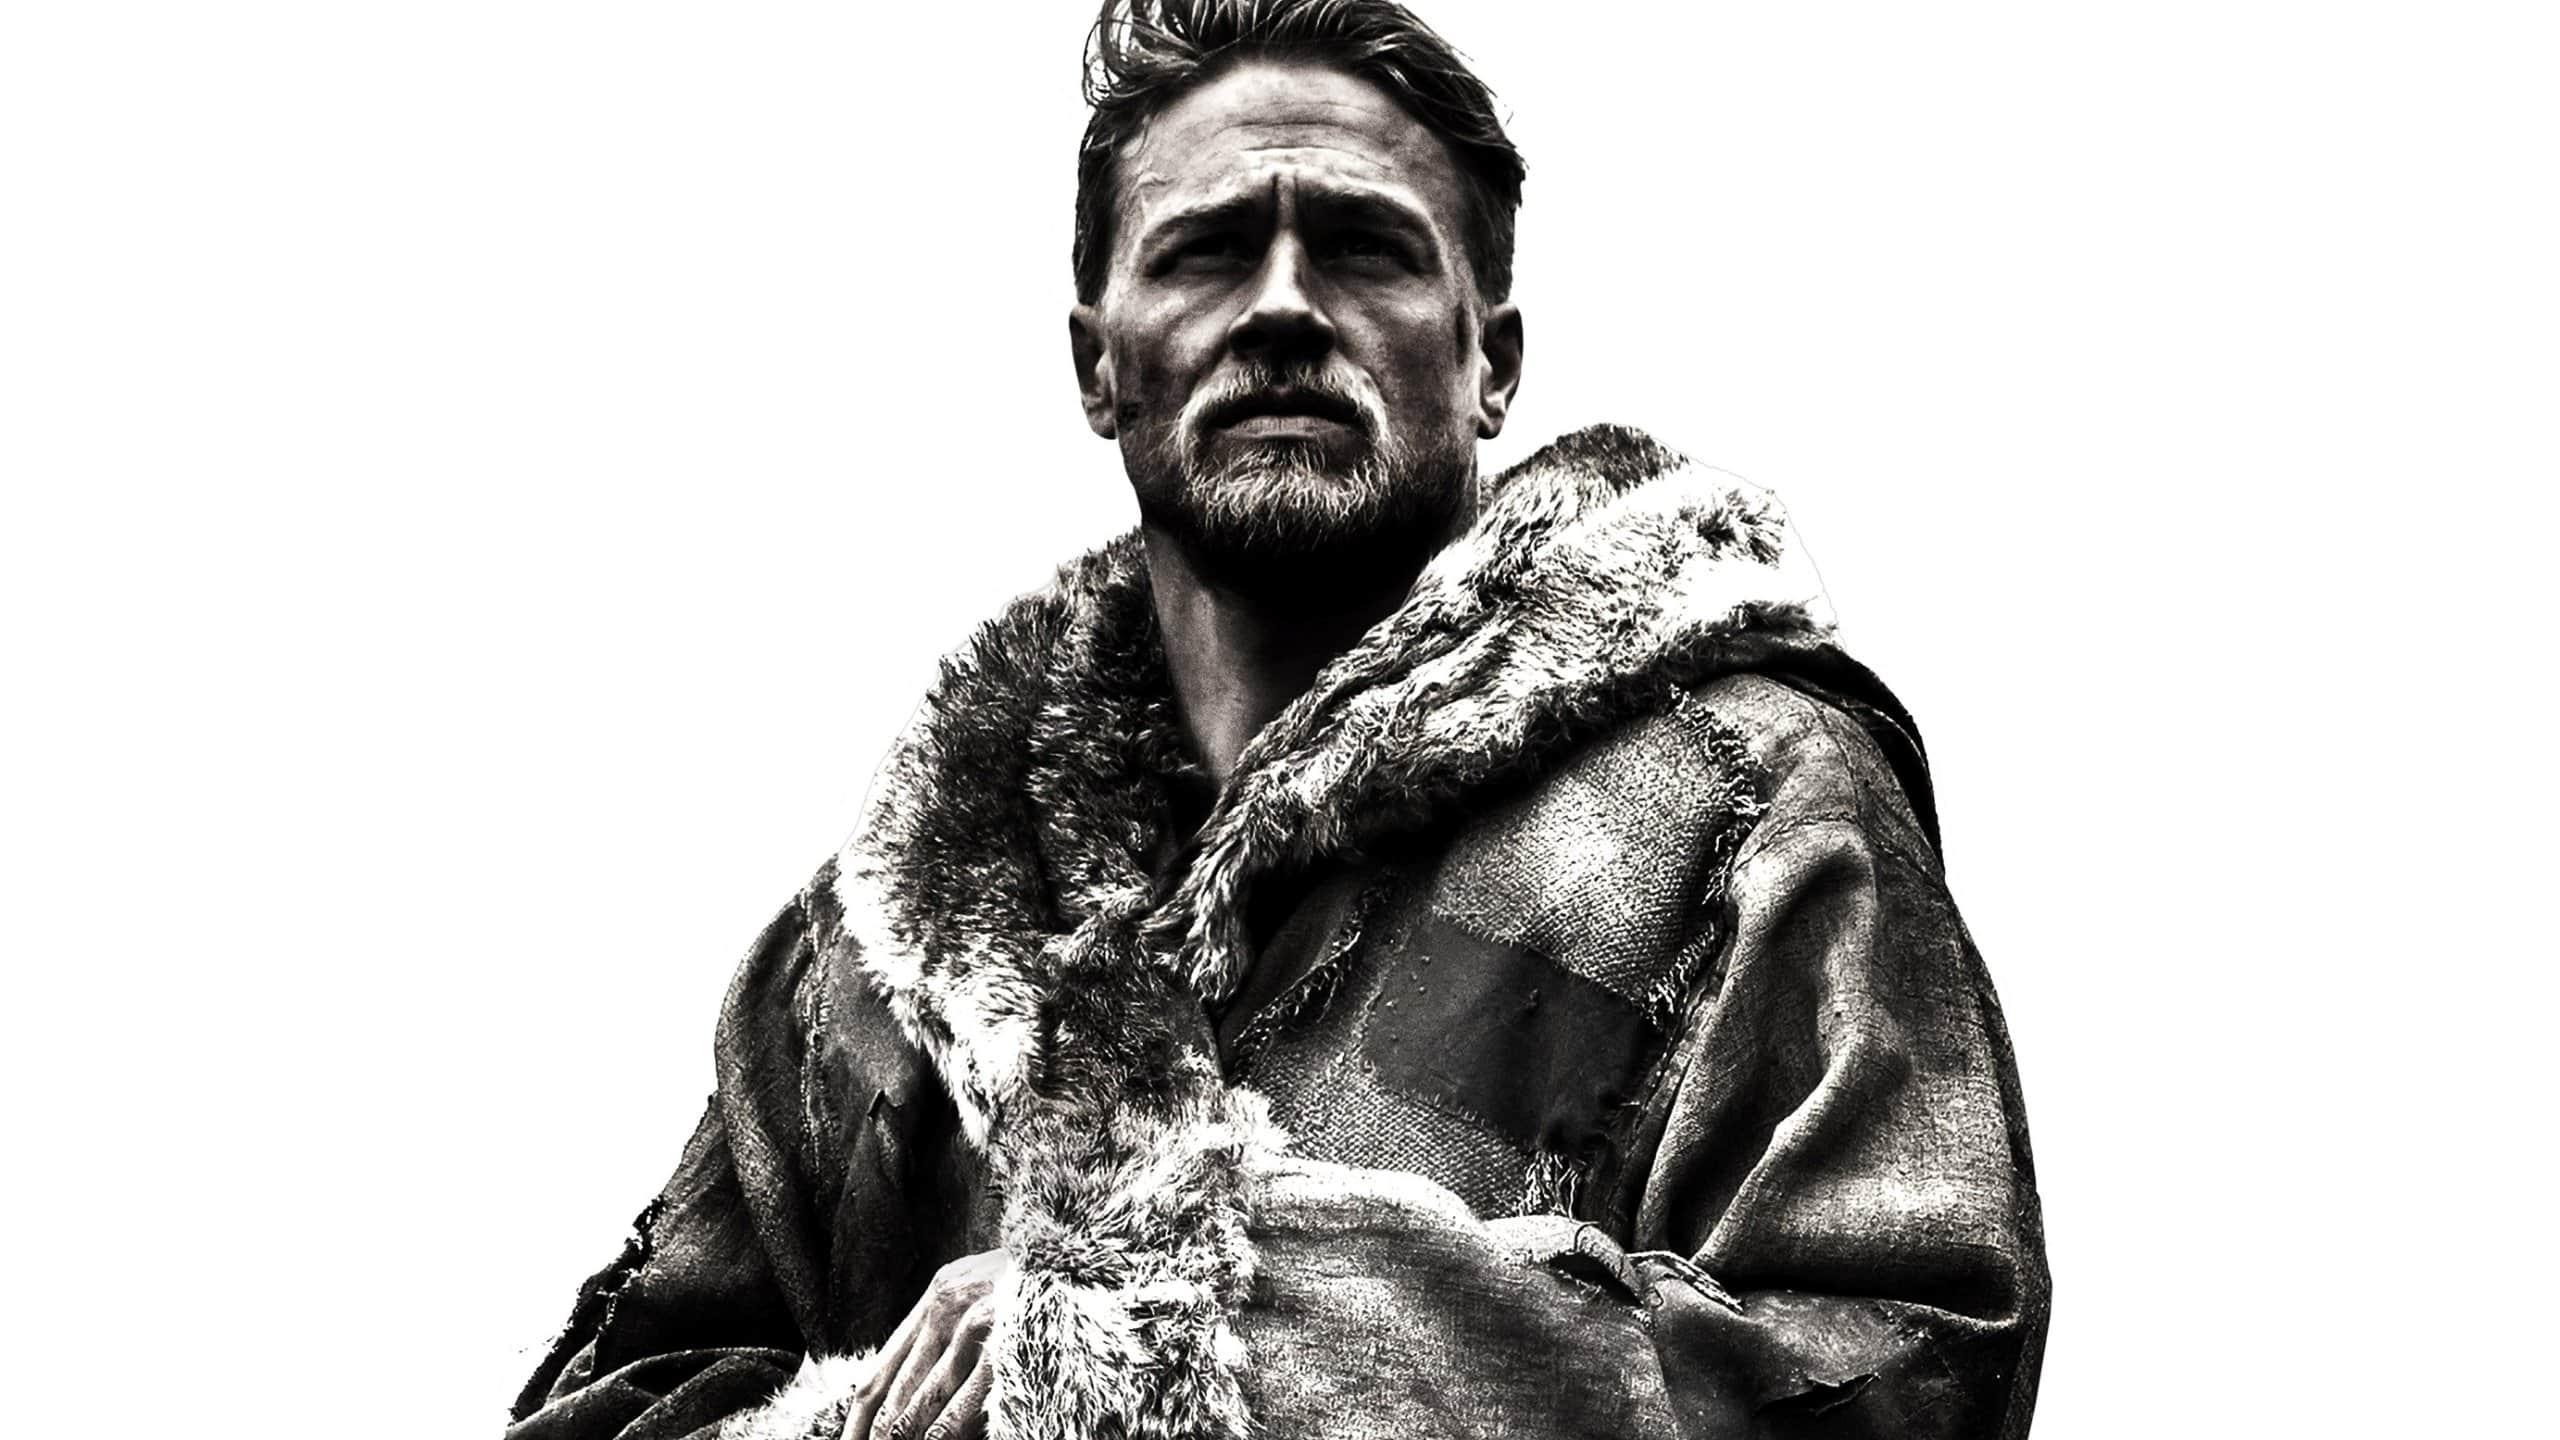 King Arthur: Legend of the Sword Screensavers